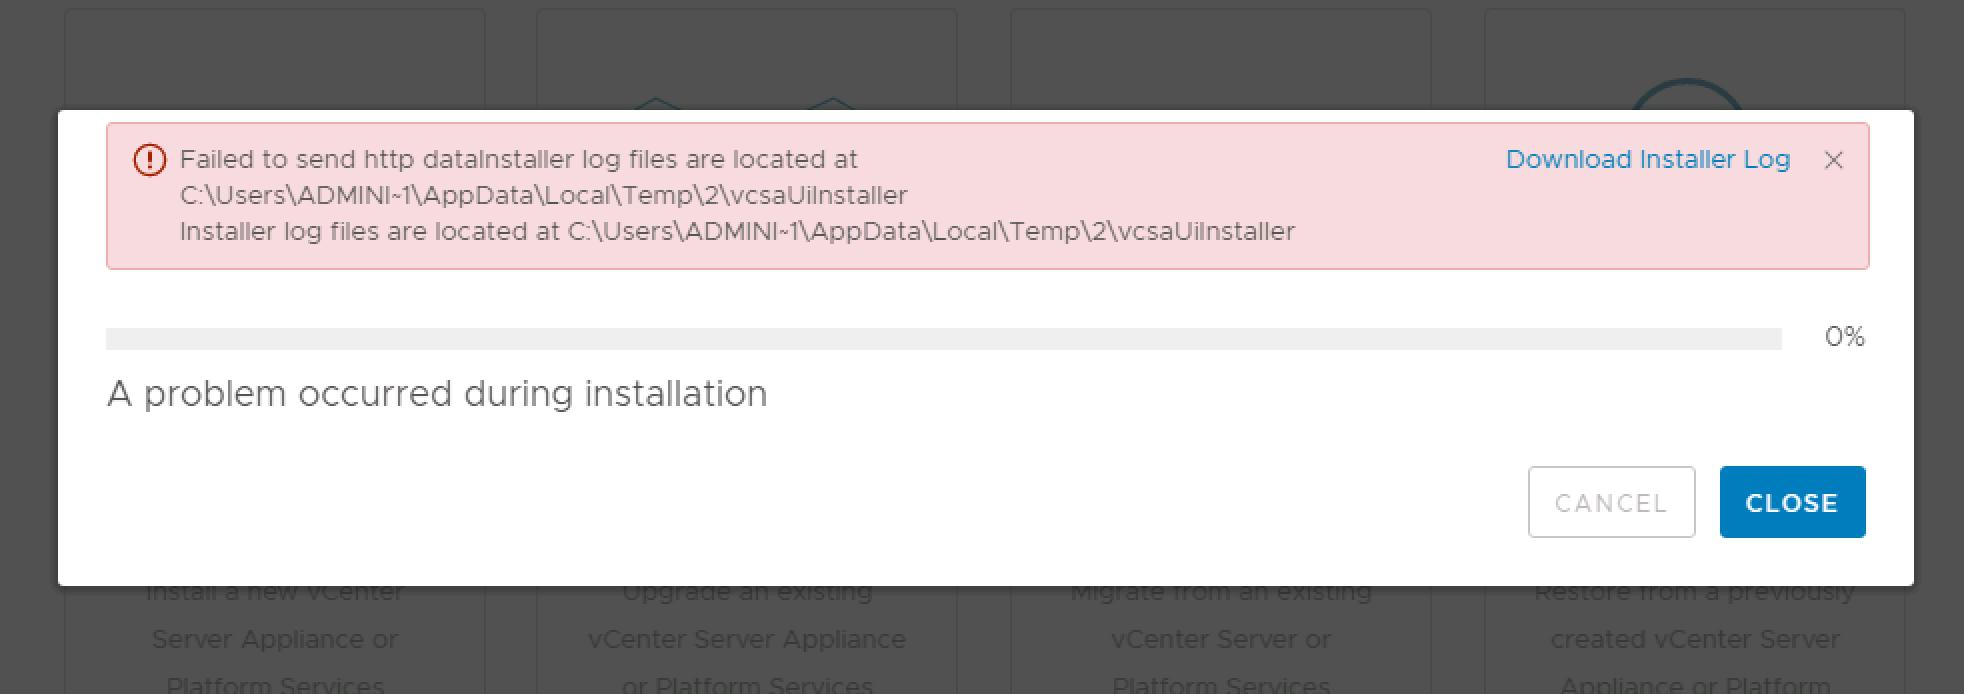 VCSA 6.7 Update 1 Upgrade Error